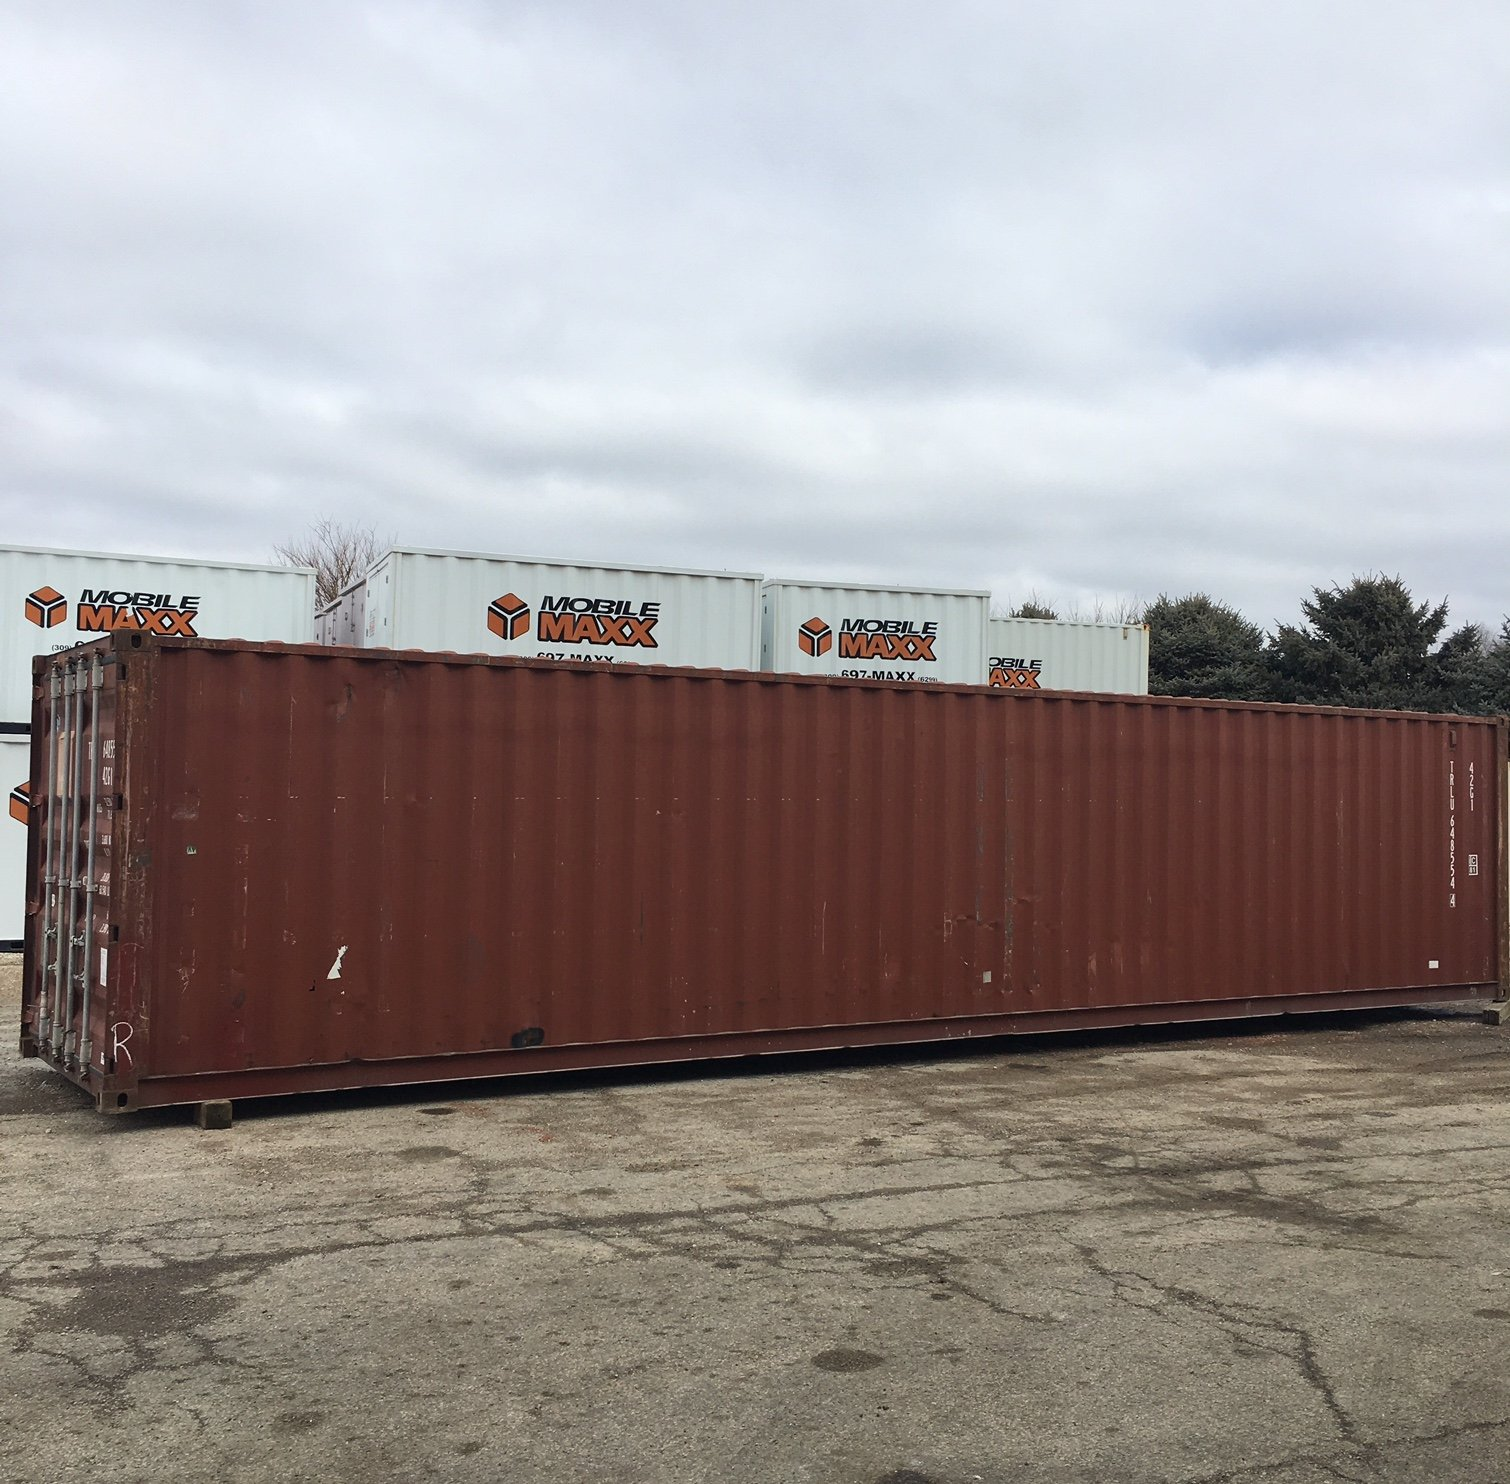 40 Ft Used Storage Container - Mobile Maxx Peoria, Illinois